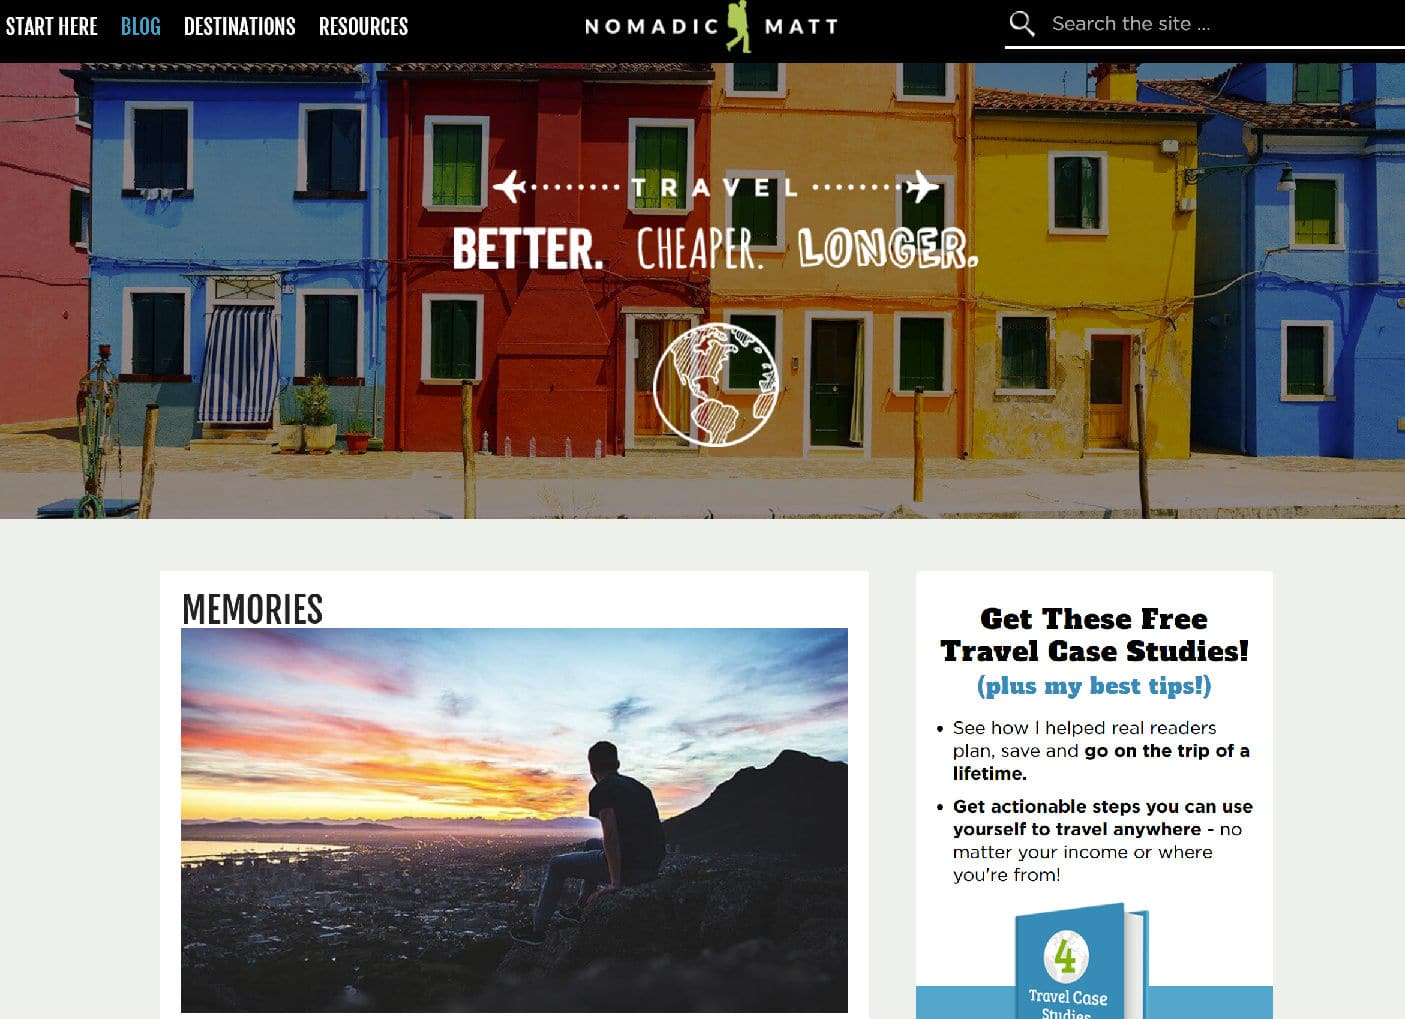 Travel blog de Nomadic Matt